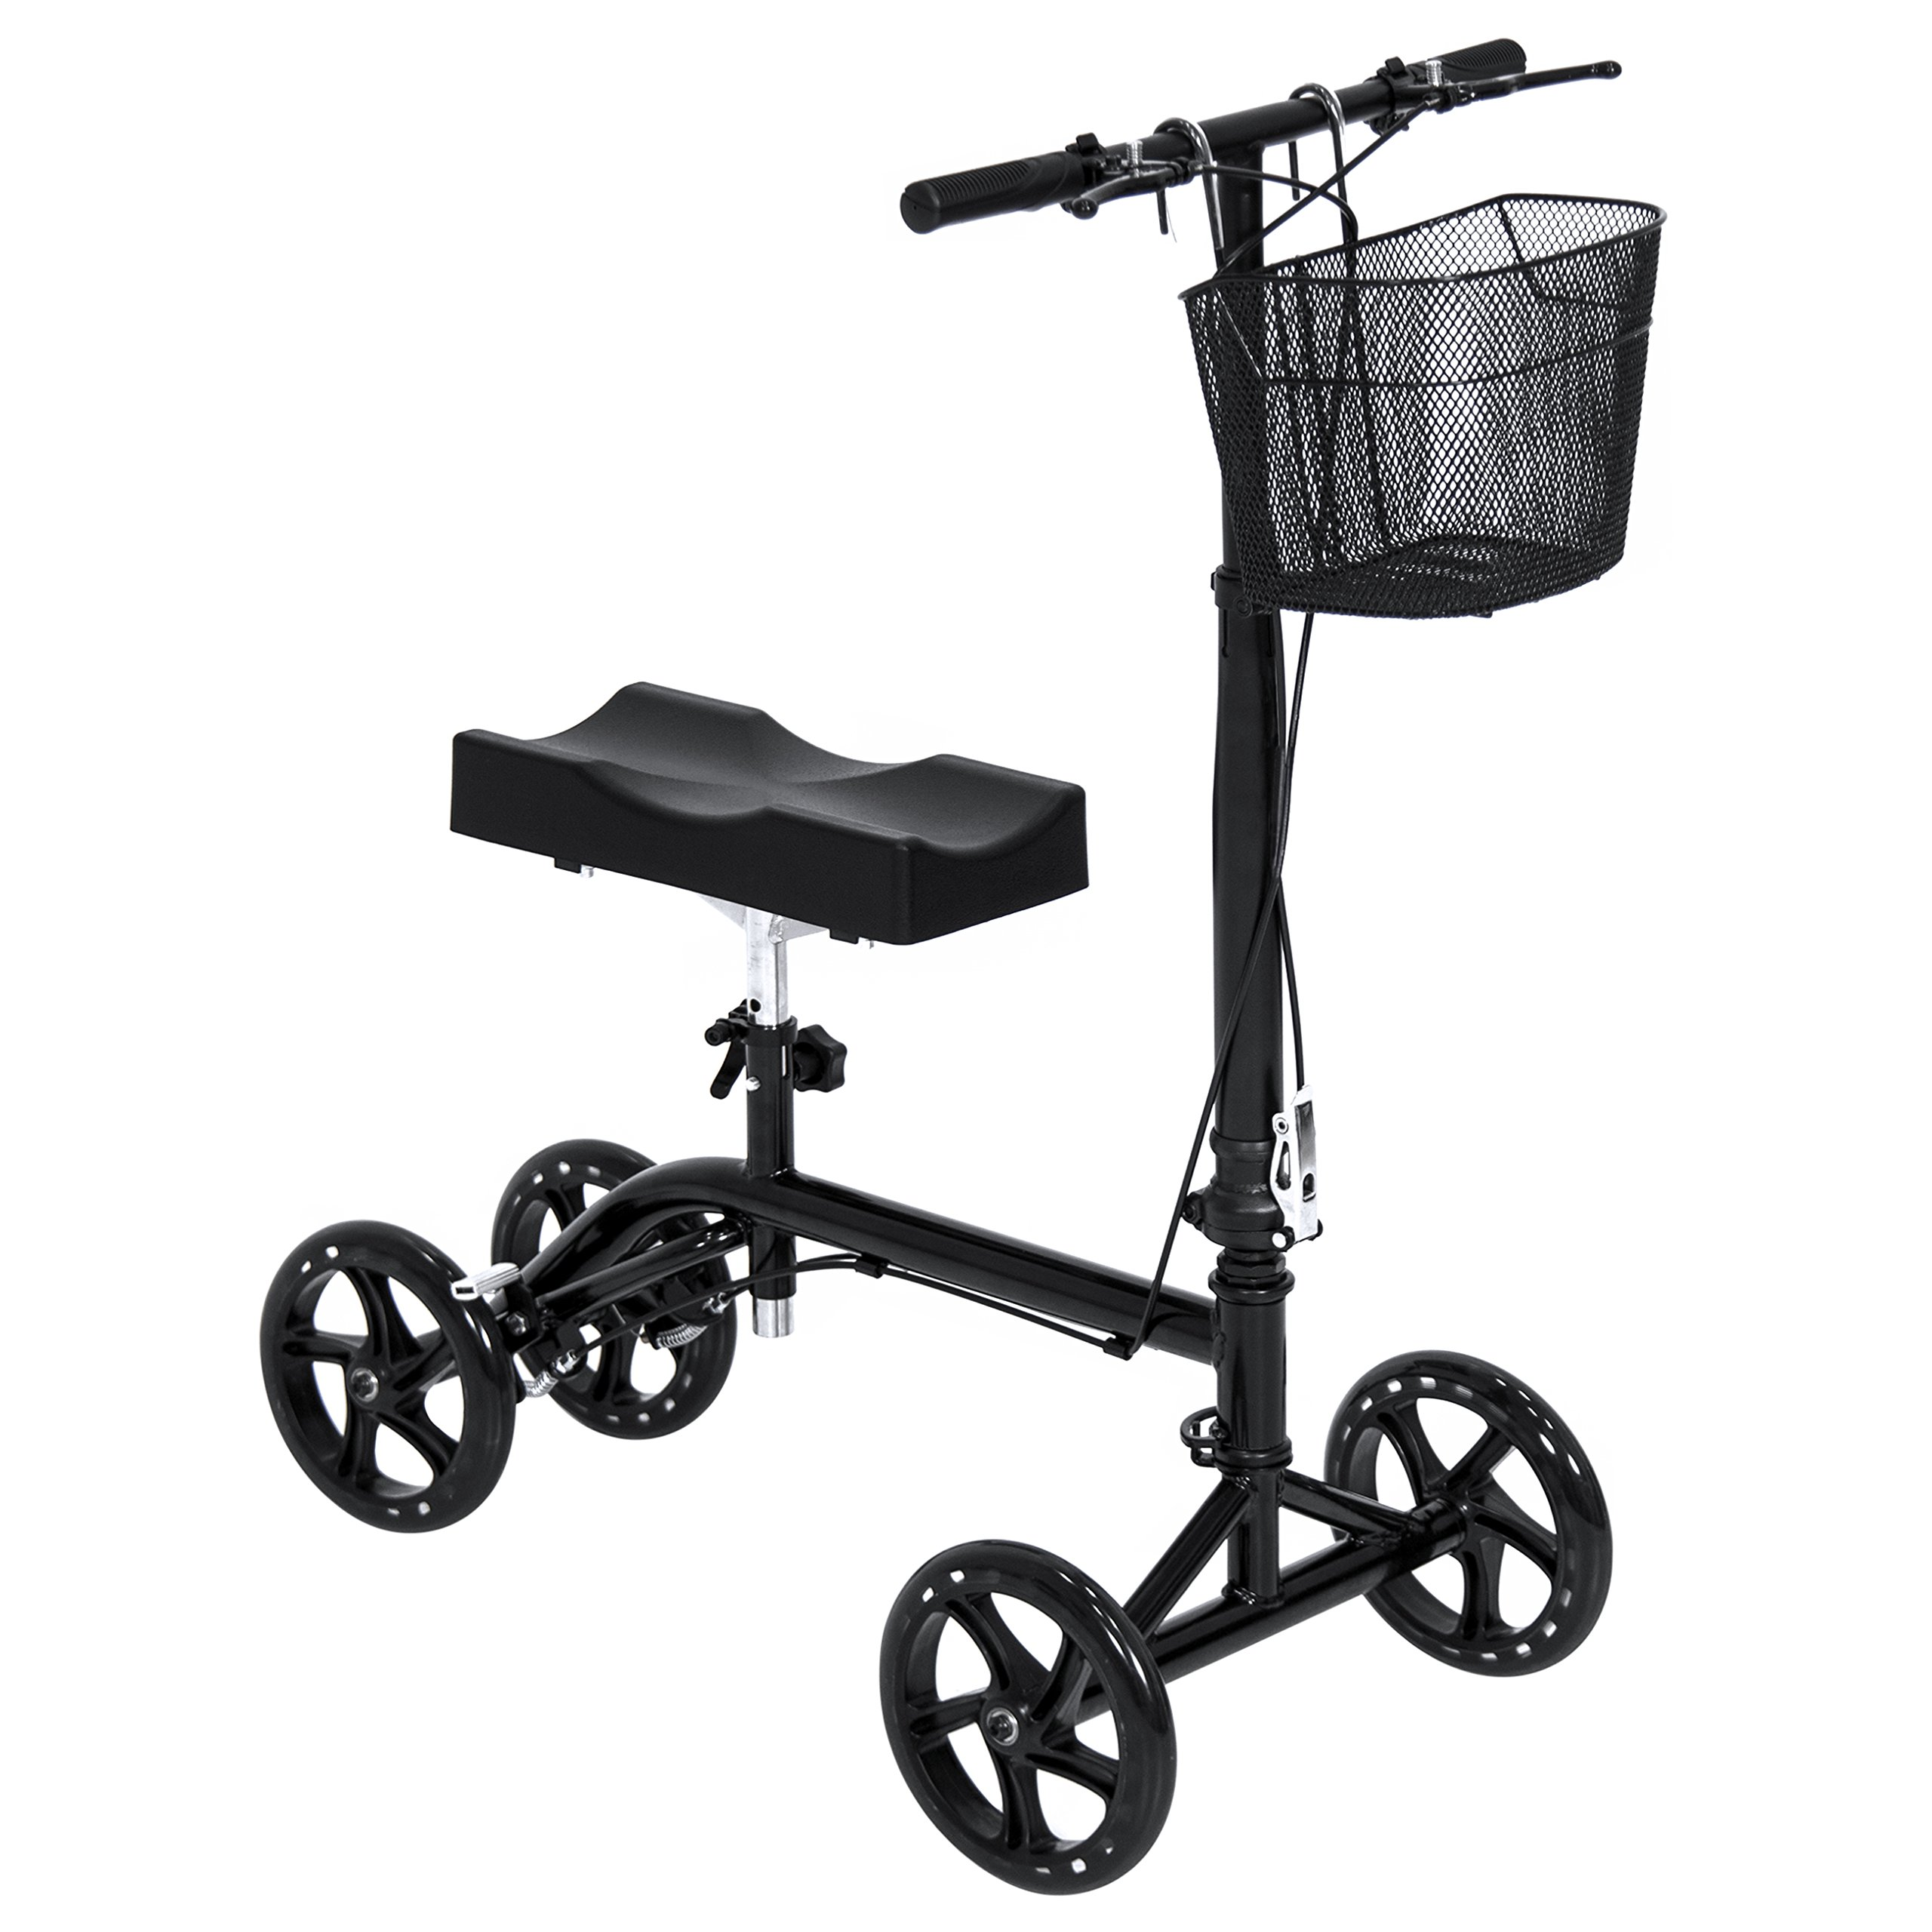 Knee Walker Scooter Leg Crutch Steerable Turning Folding W/ Basket FDA Approved